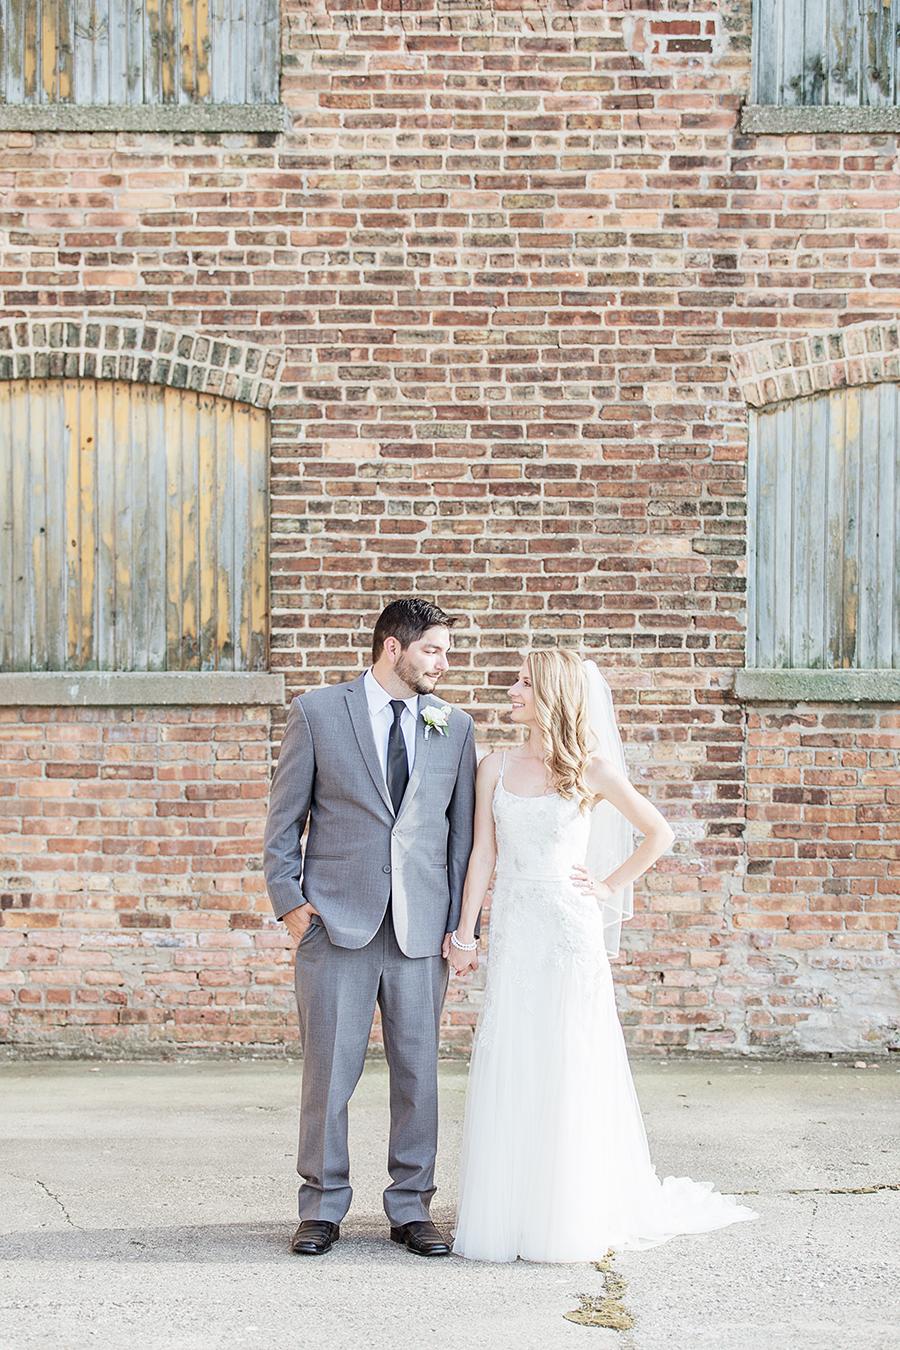 Naperville-wedding-photographer-71 2.jpg